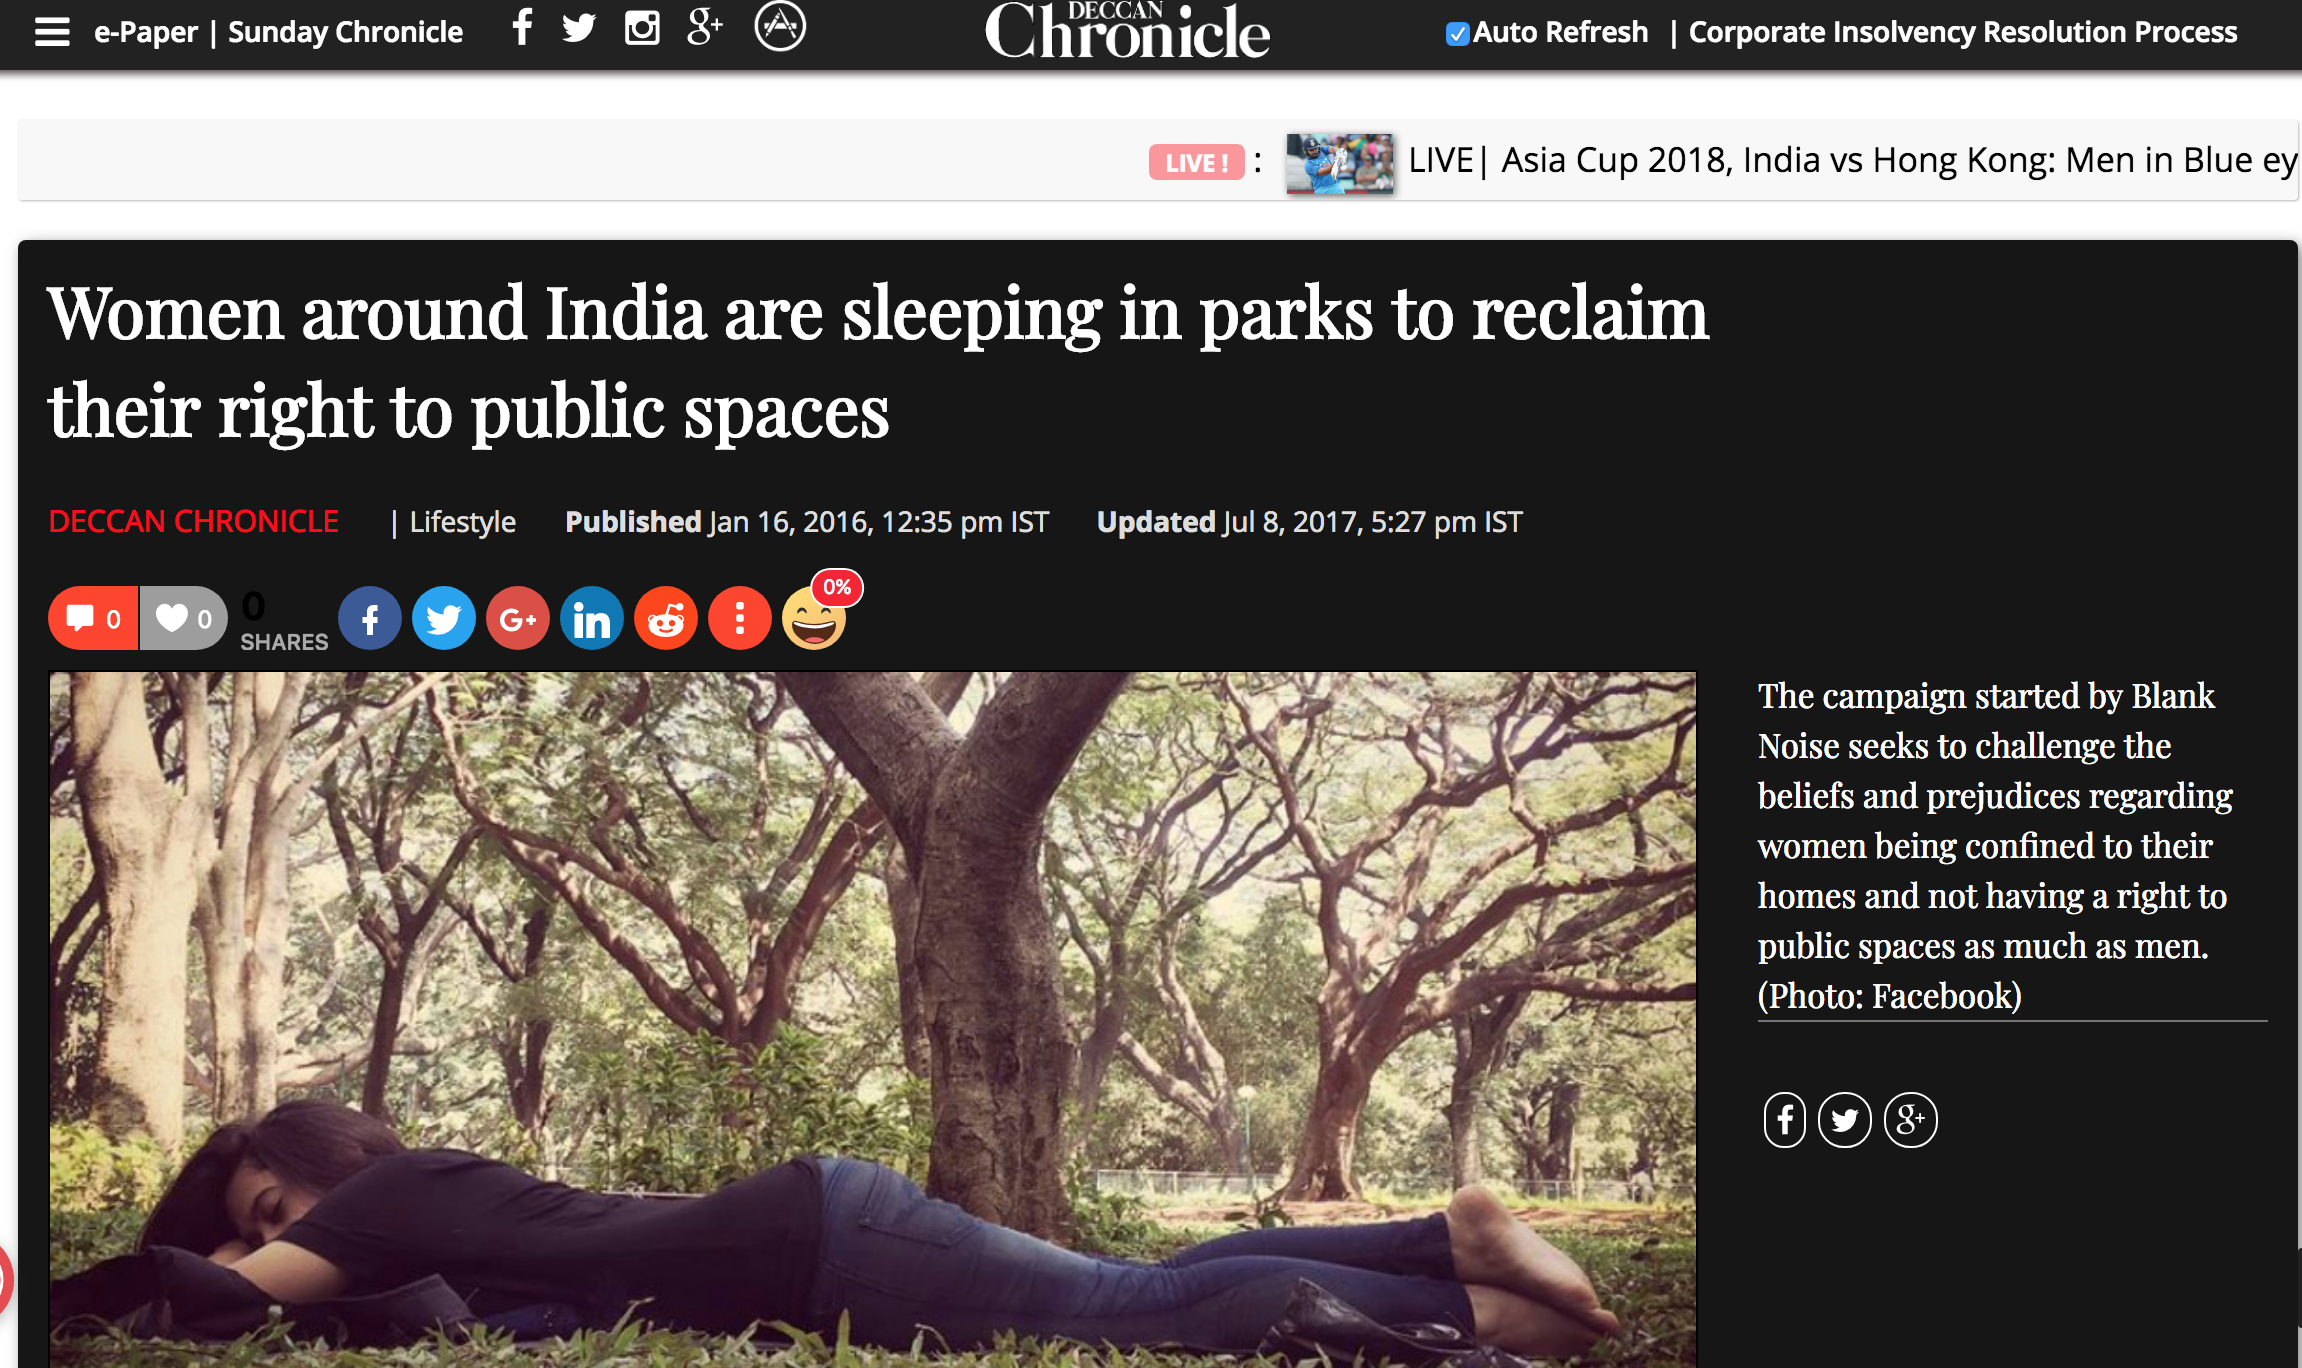 Deccan Chronicle, 2016